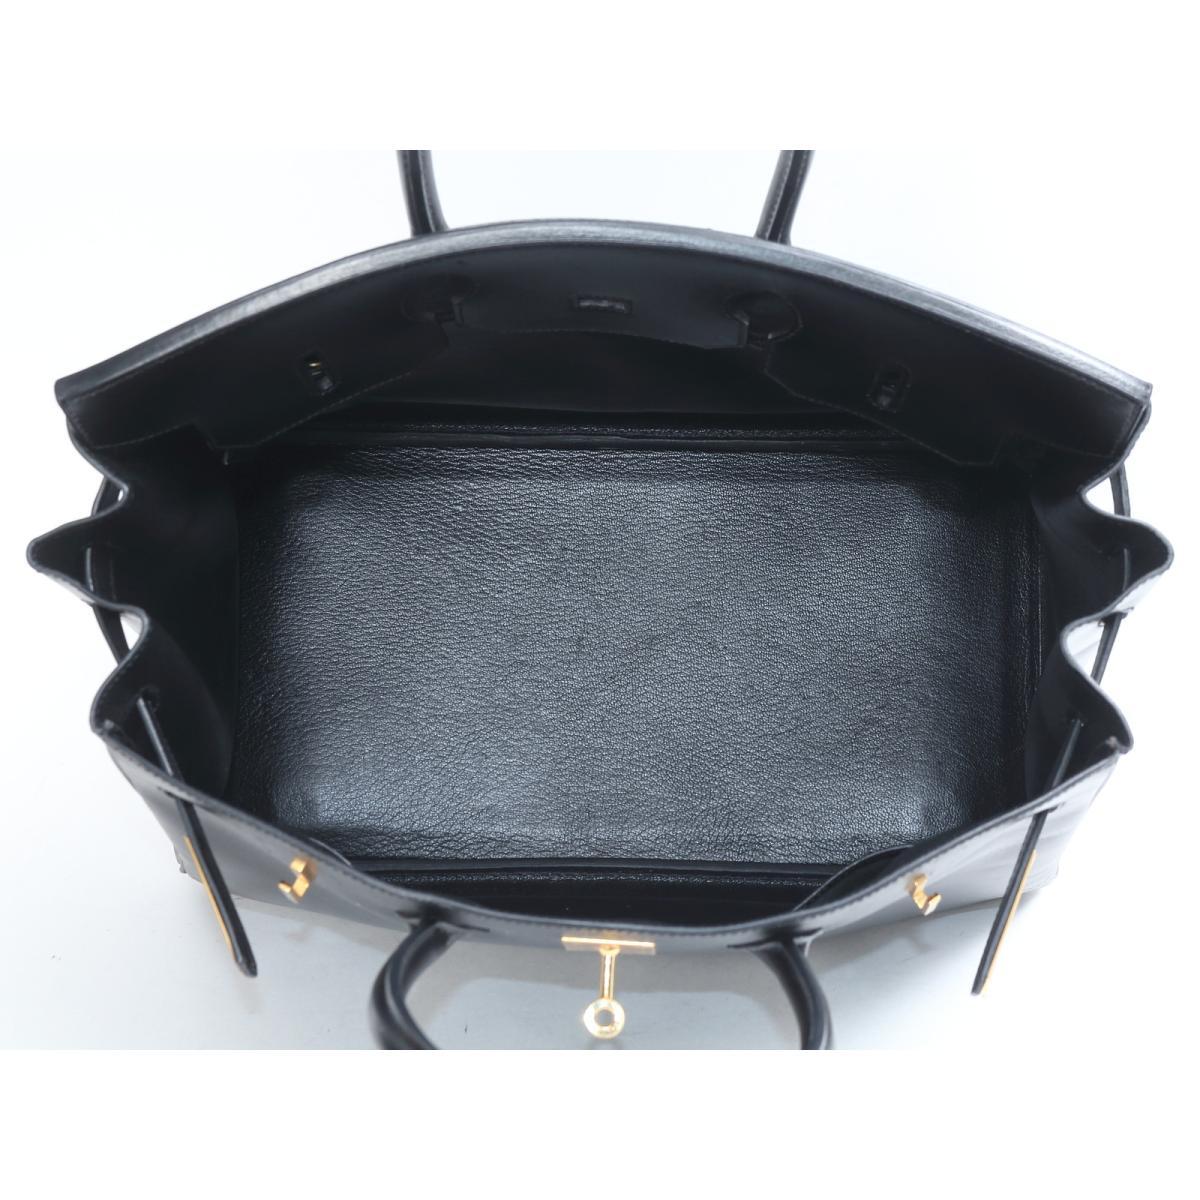 b39c9c281f1 (Free shipping) Auth HERMES Birkin 35 Hand Tote Bag Box Calf Leather Black  x GHW Used